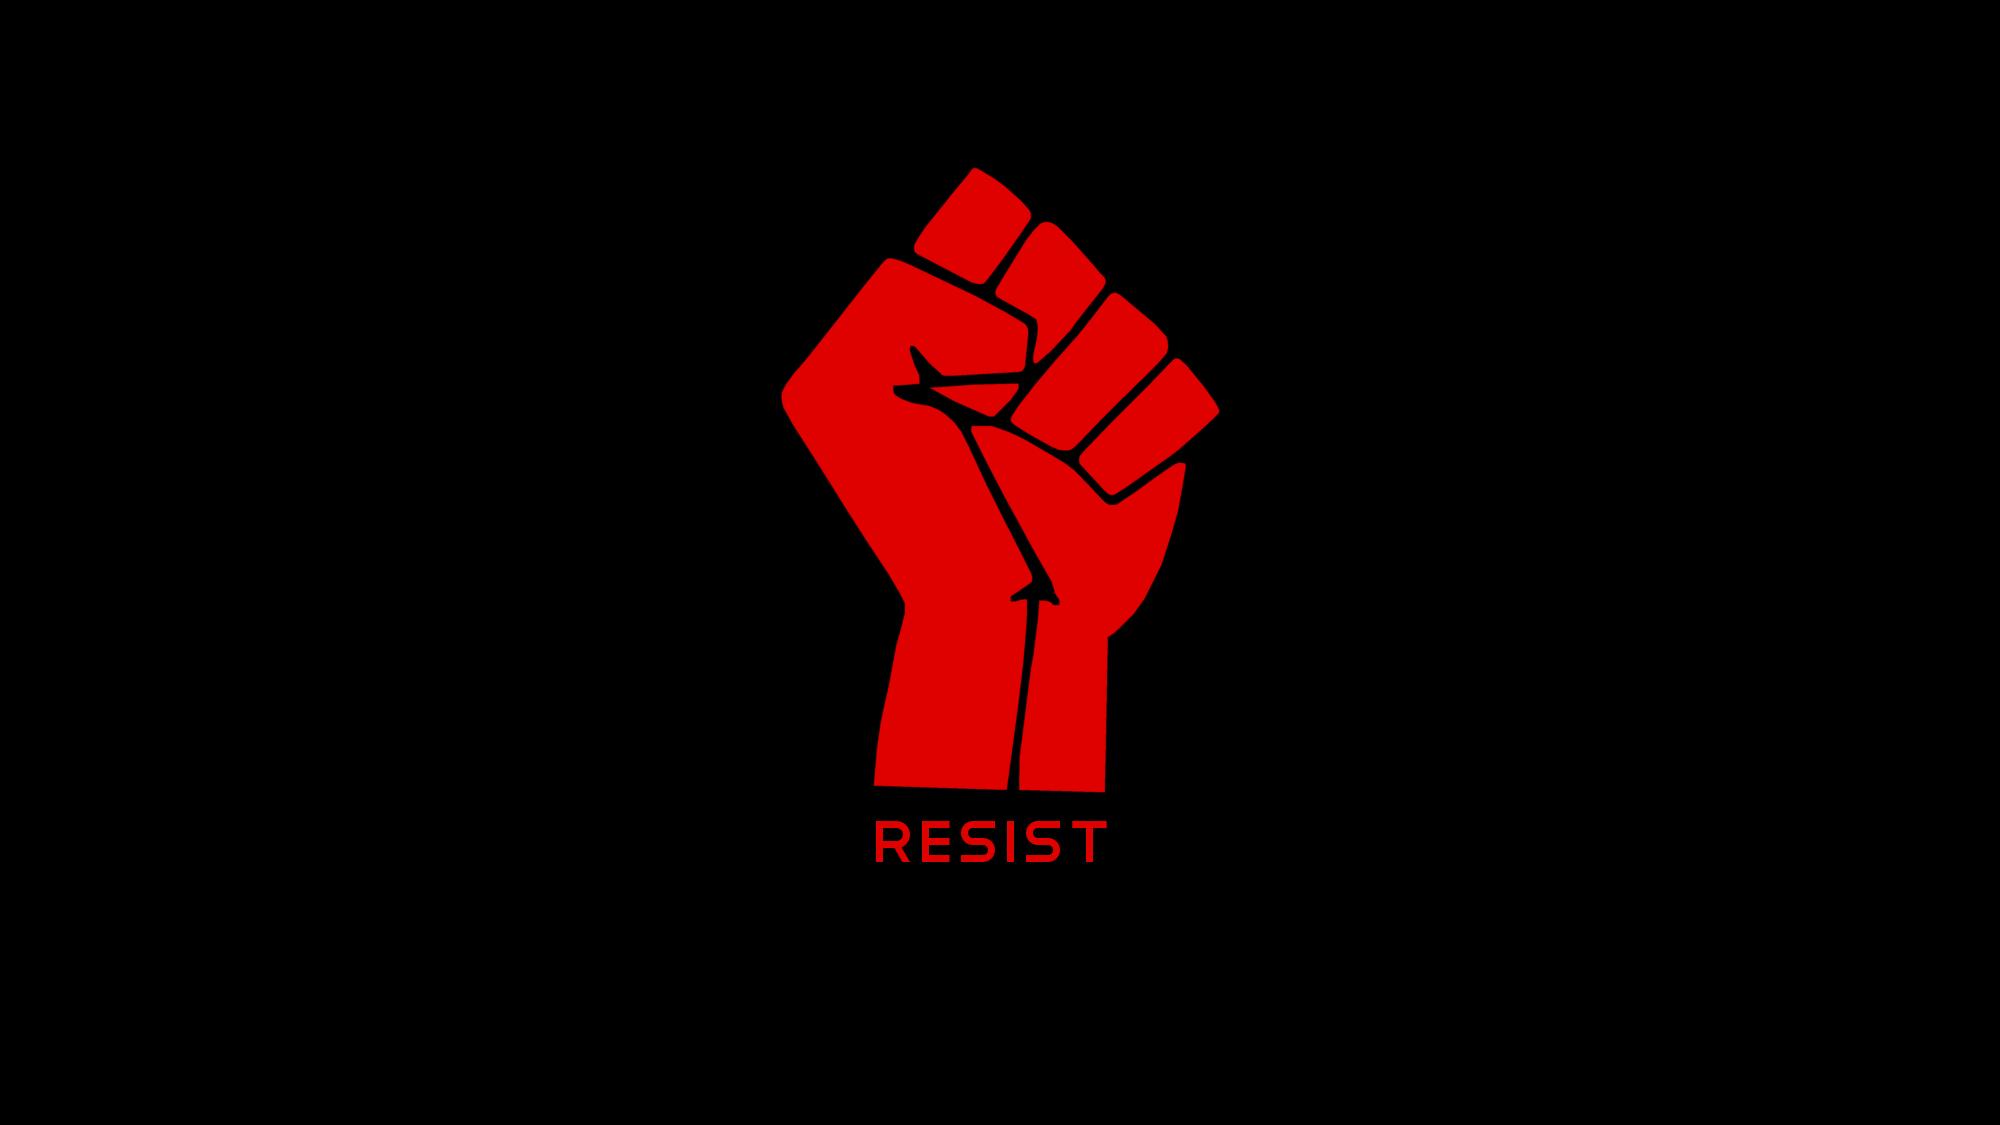 Freedom Resistance 20001125 Wallpaper 2153634 2000x1125